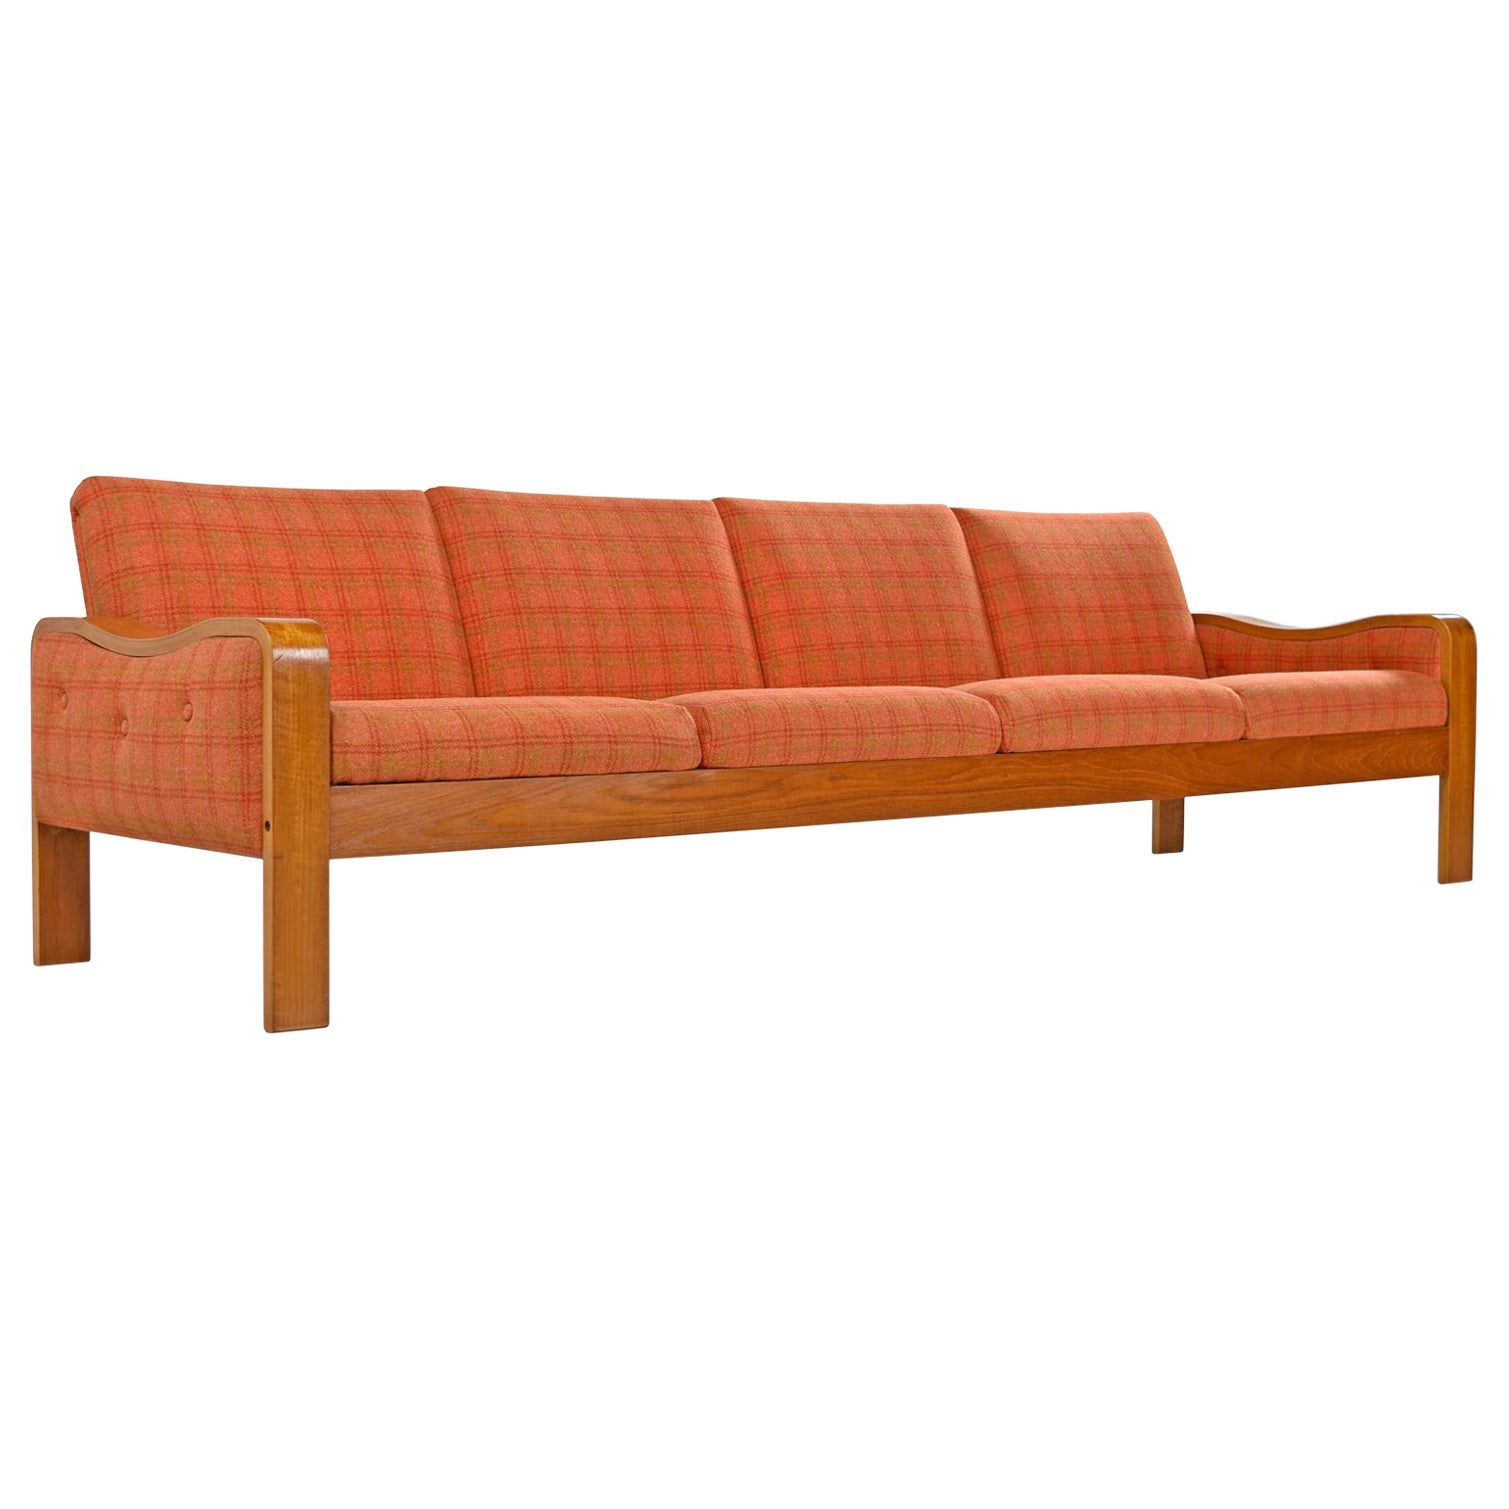 Original Midcentury Bent Teak Plaid Wool Fabric Danish Modern Sofa Couch